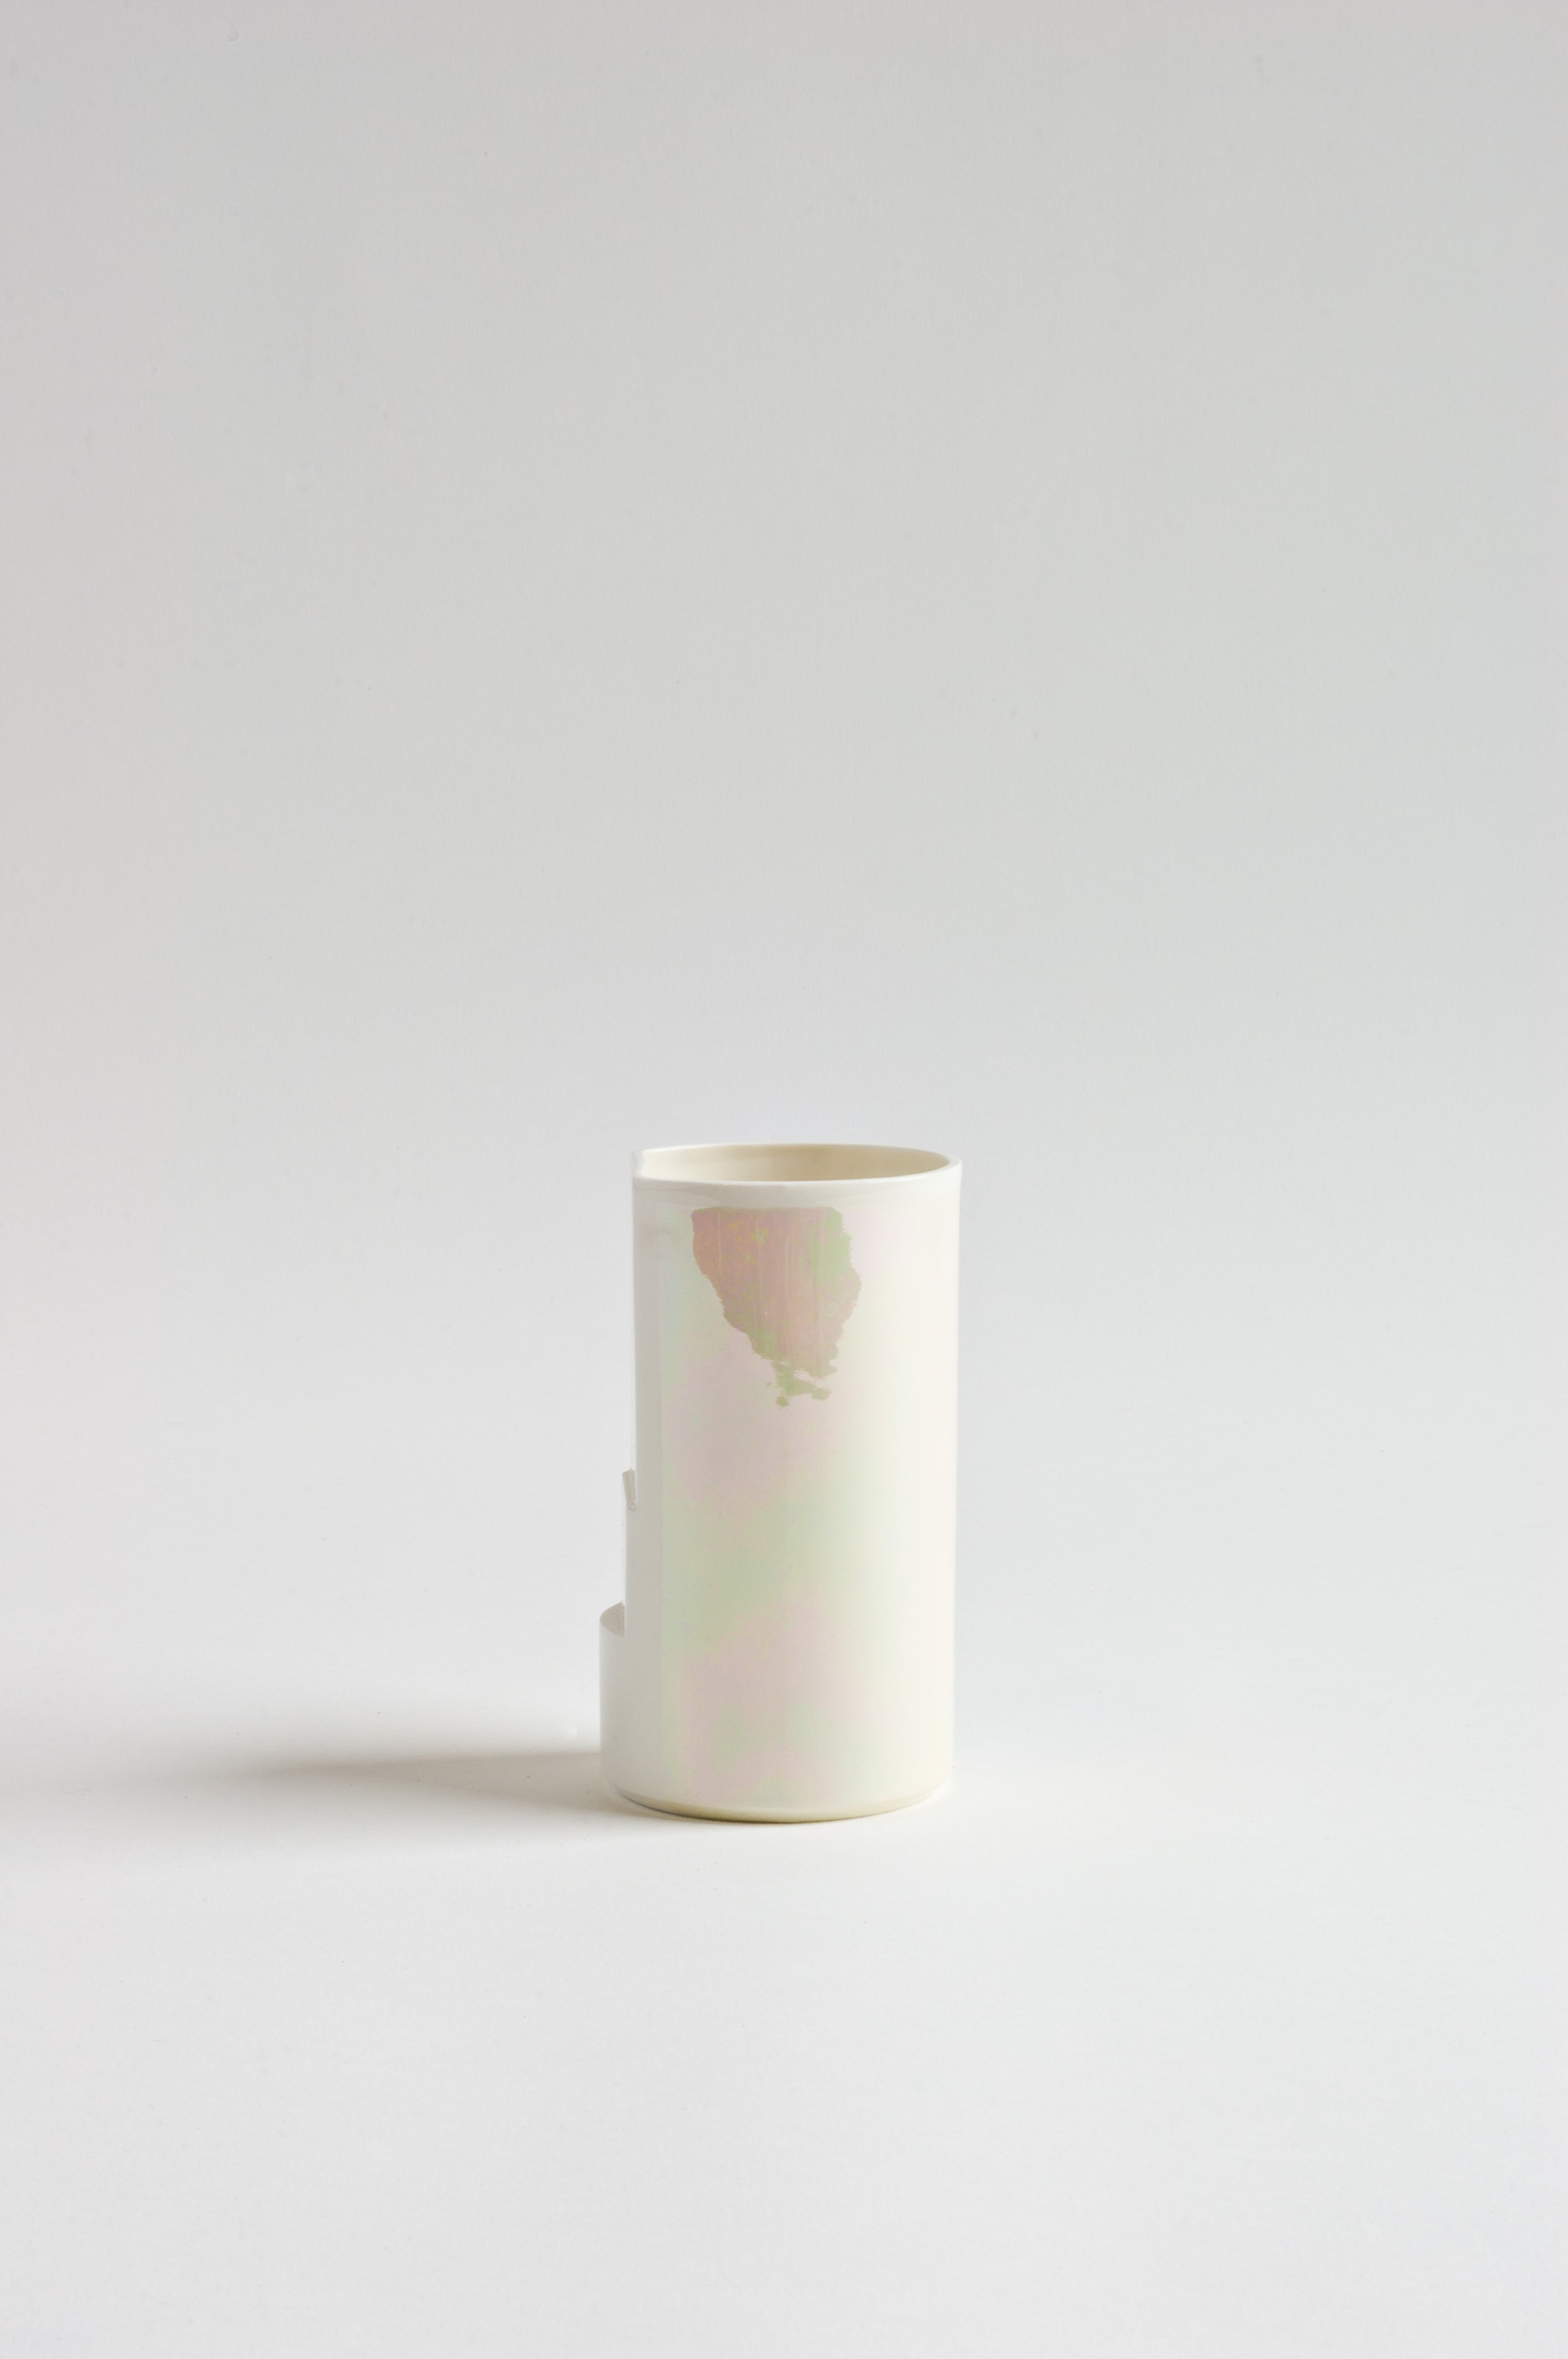 a5_minalemaeda_manufactured_ceramics_mdby_mdba_cadcam_tableware_05_mop luster